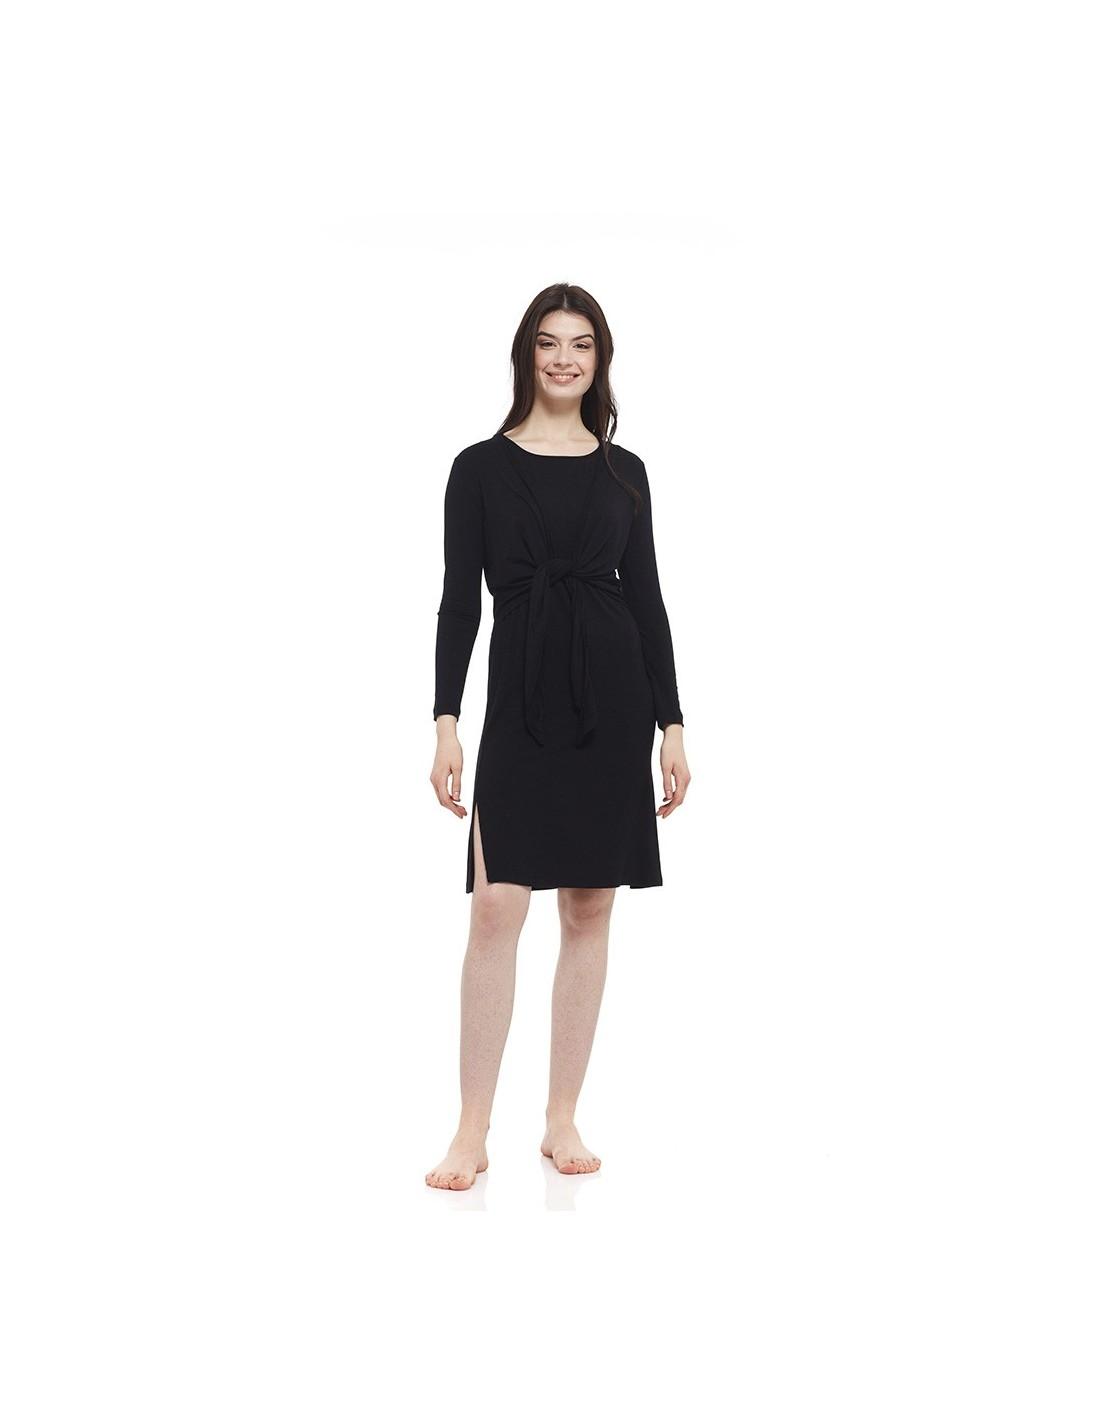 Bamboo Sleeveless Dress In Bamboo Yogaessential Made